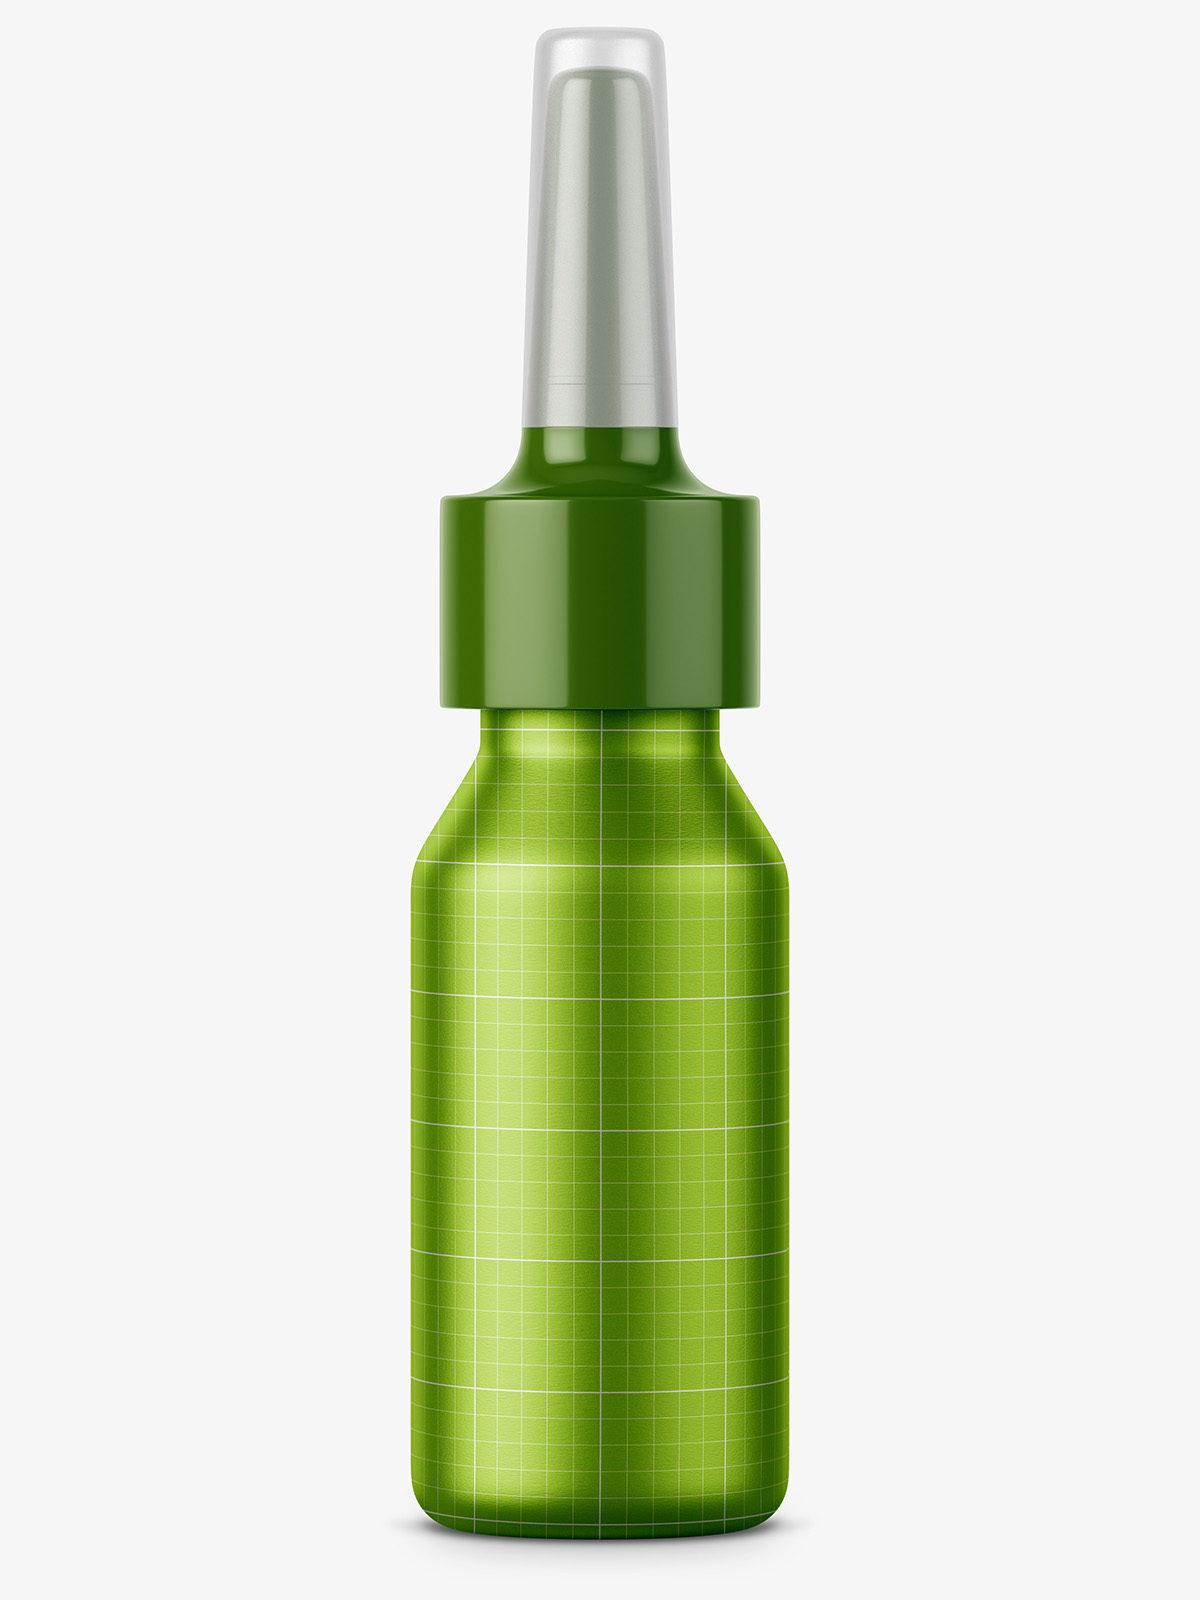 Metal nasal bottle mockup